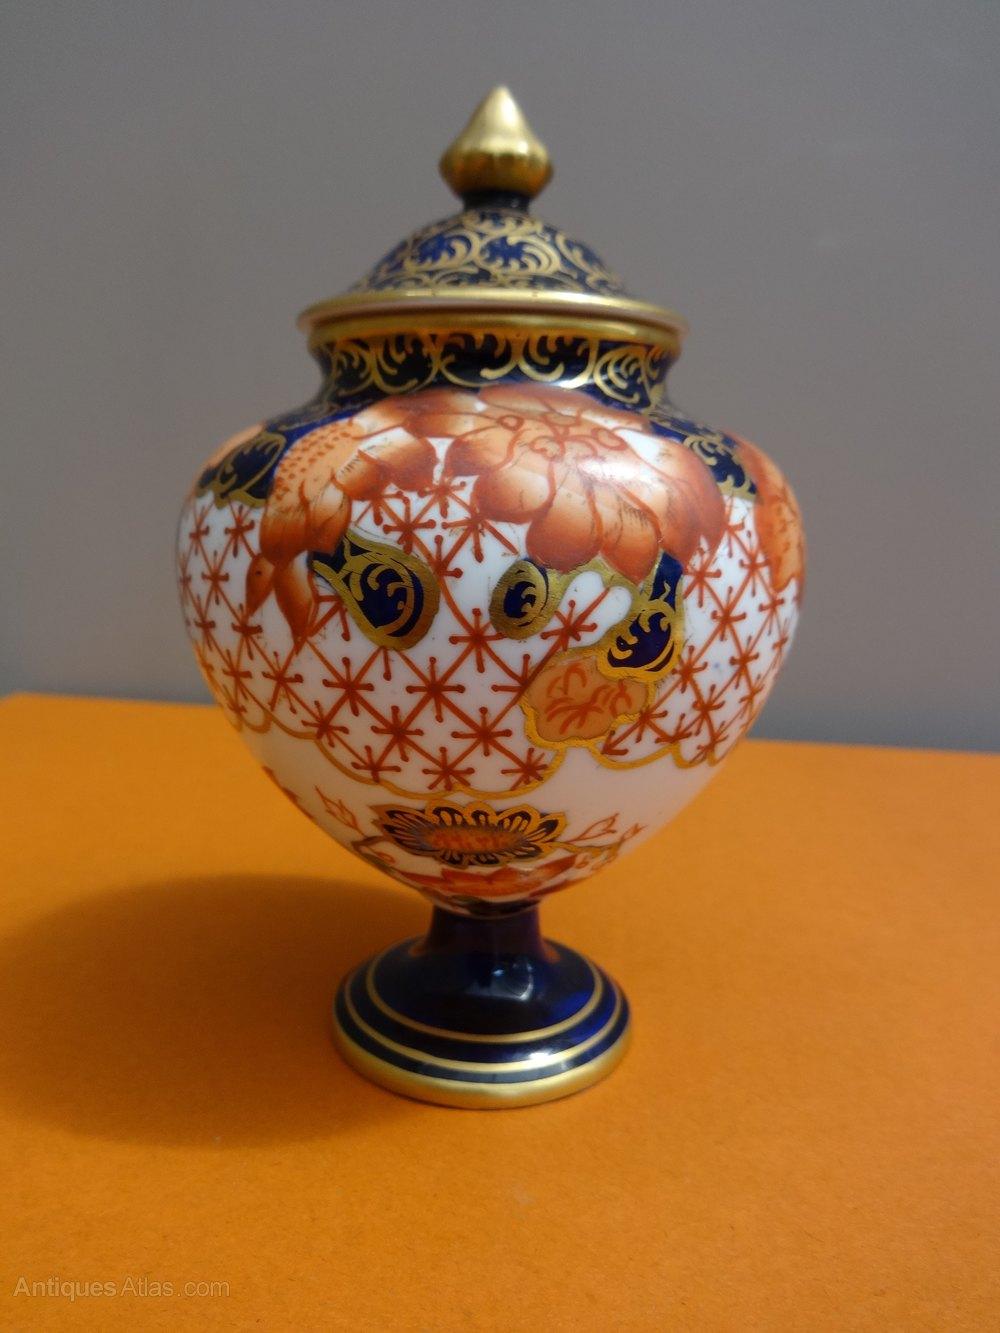 Antiques atlas miniature royal crown derby vase and cover photos miniature royal crown derby vase reviewsmspy